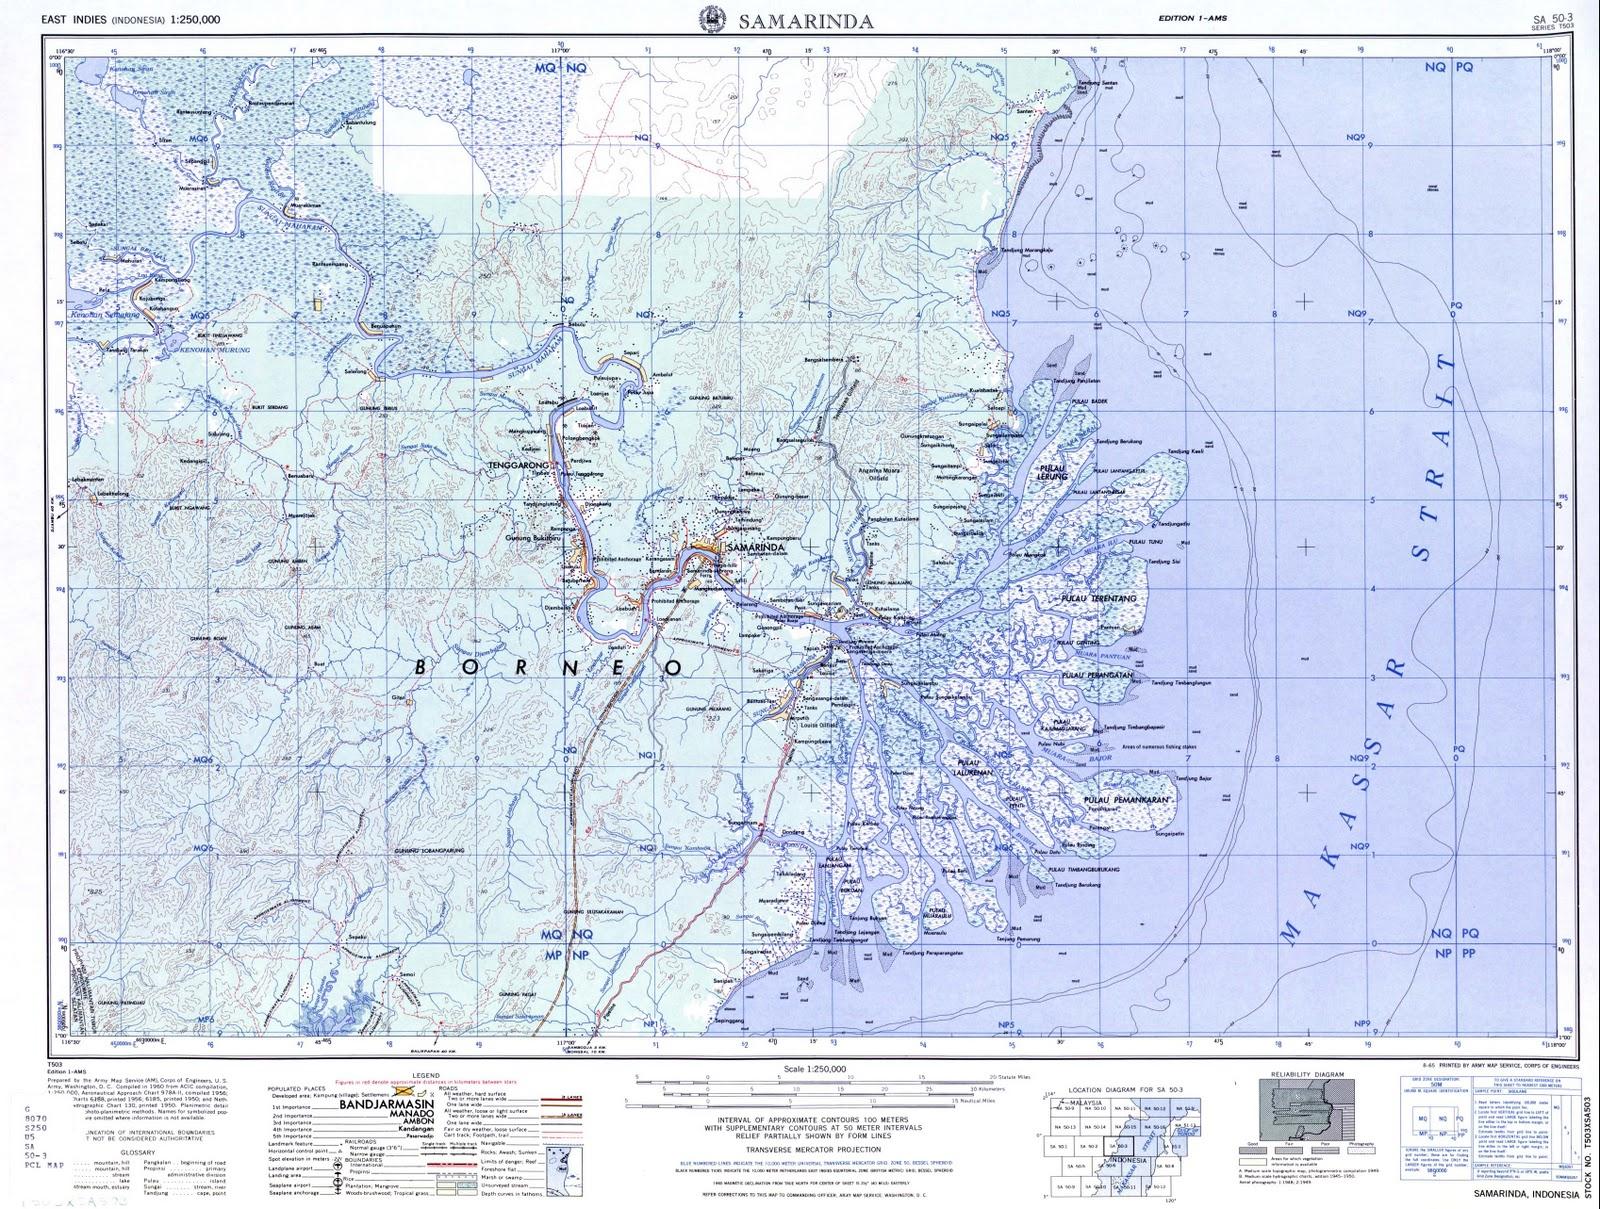 Samarinda Indonesia  city photos gallery : TAKJUB INDONESIA: Peta Topografi Samarinda skala 250k